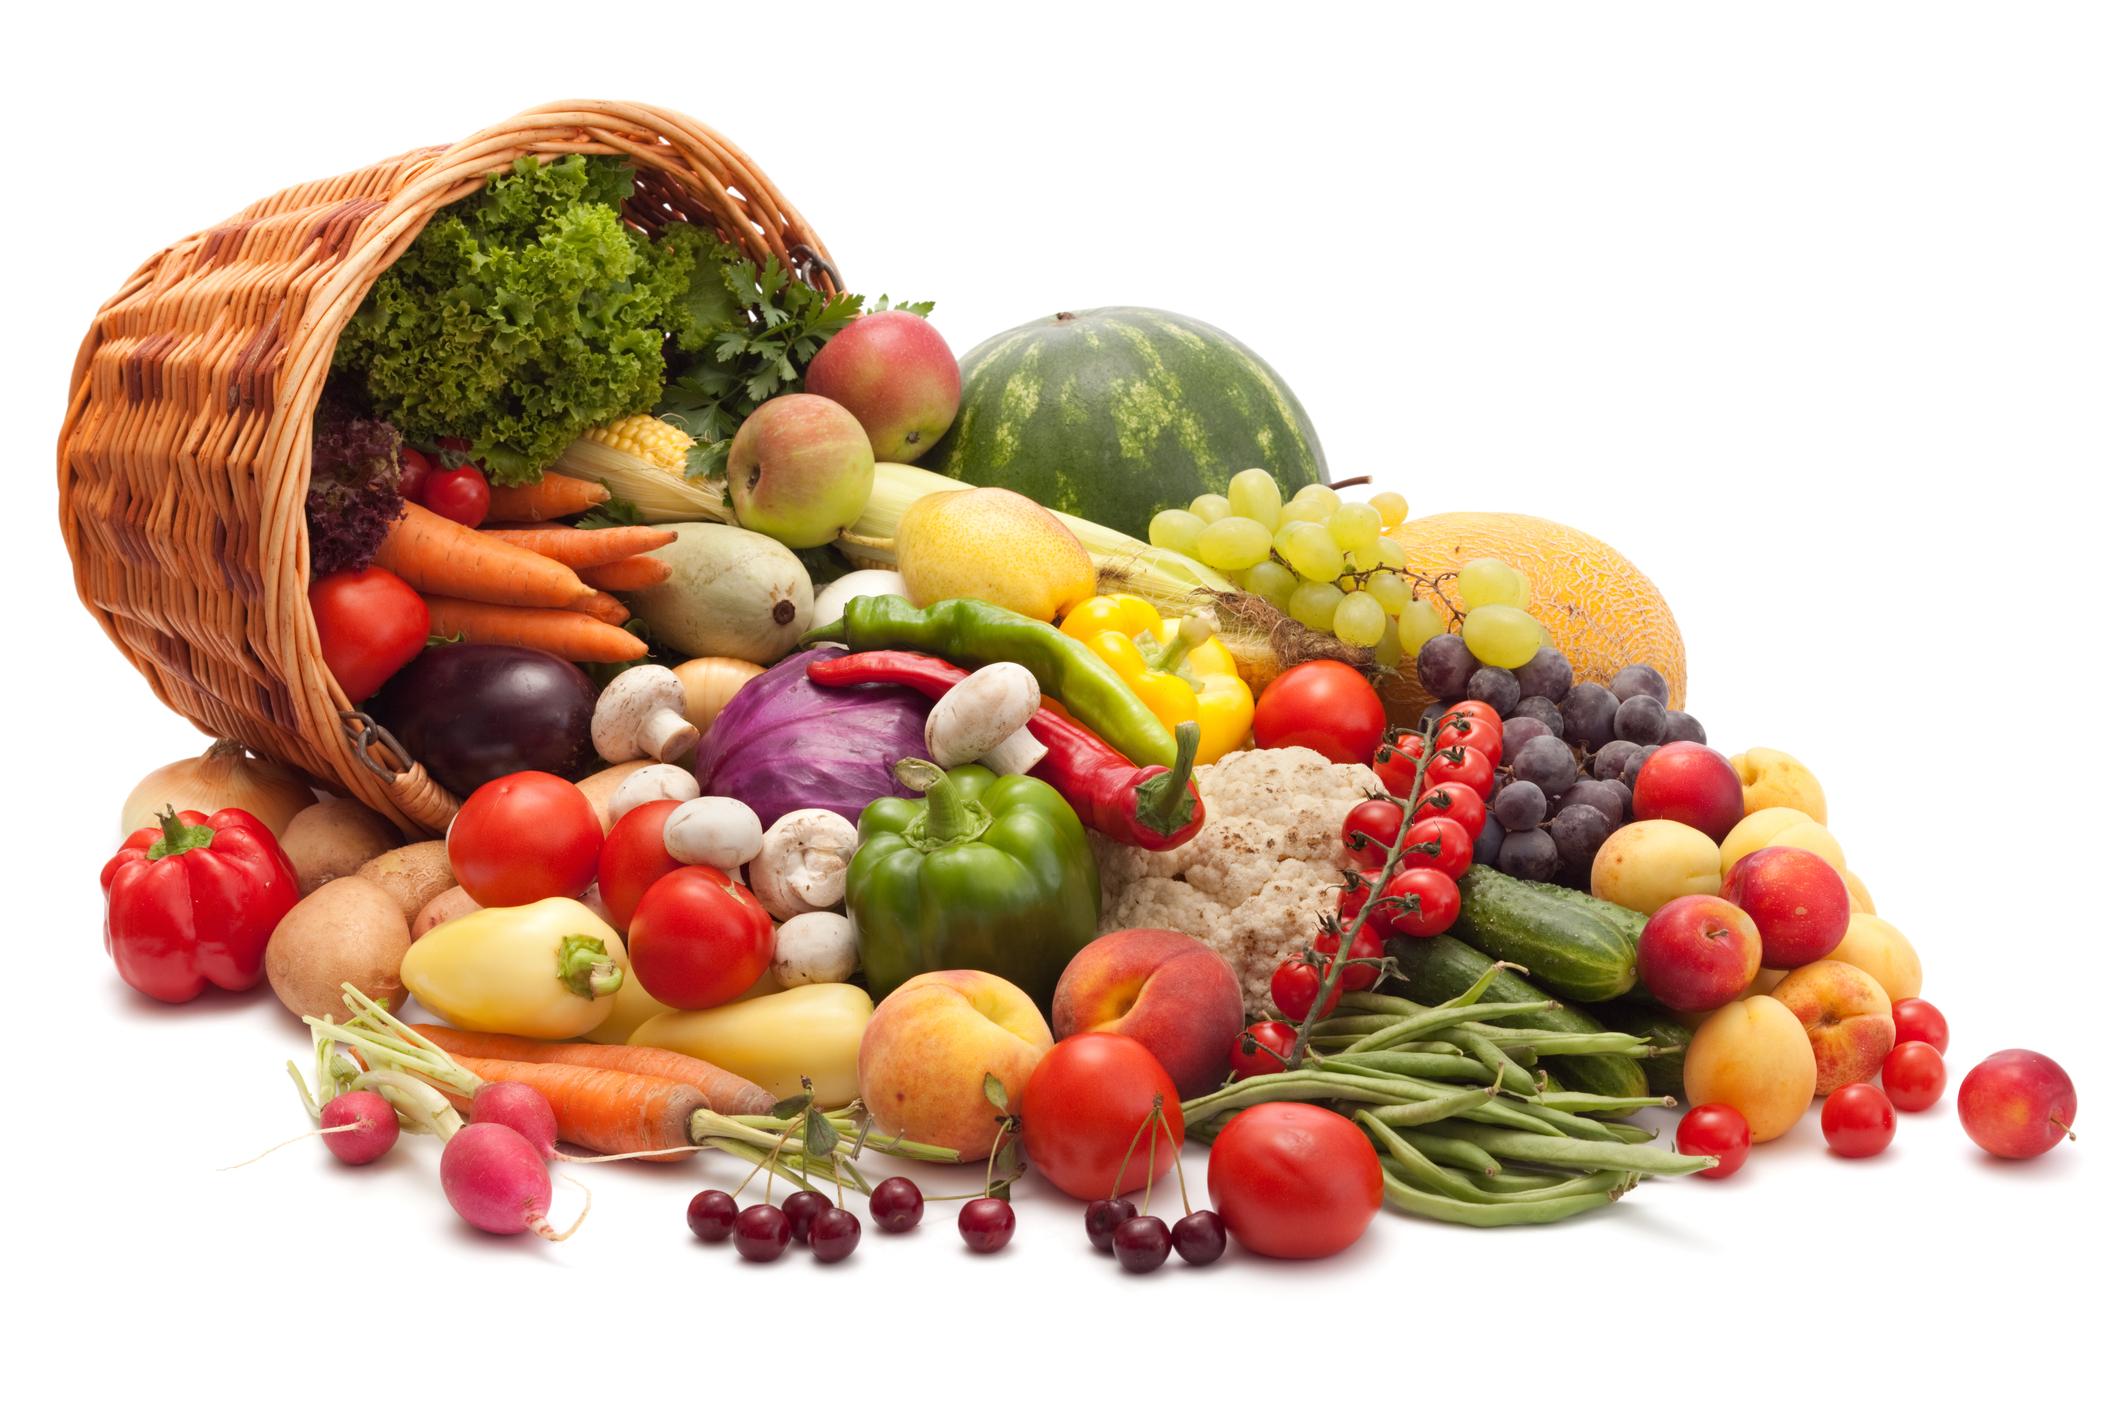 oro-gold-on-vegan-food.jpg